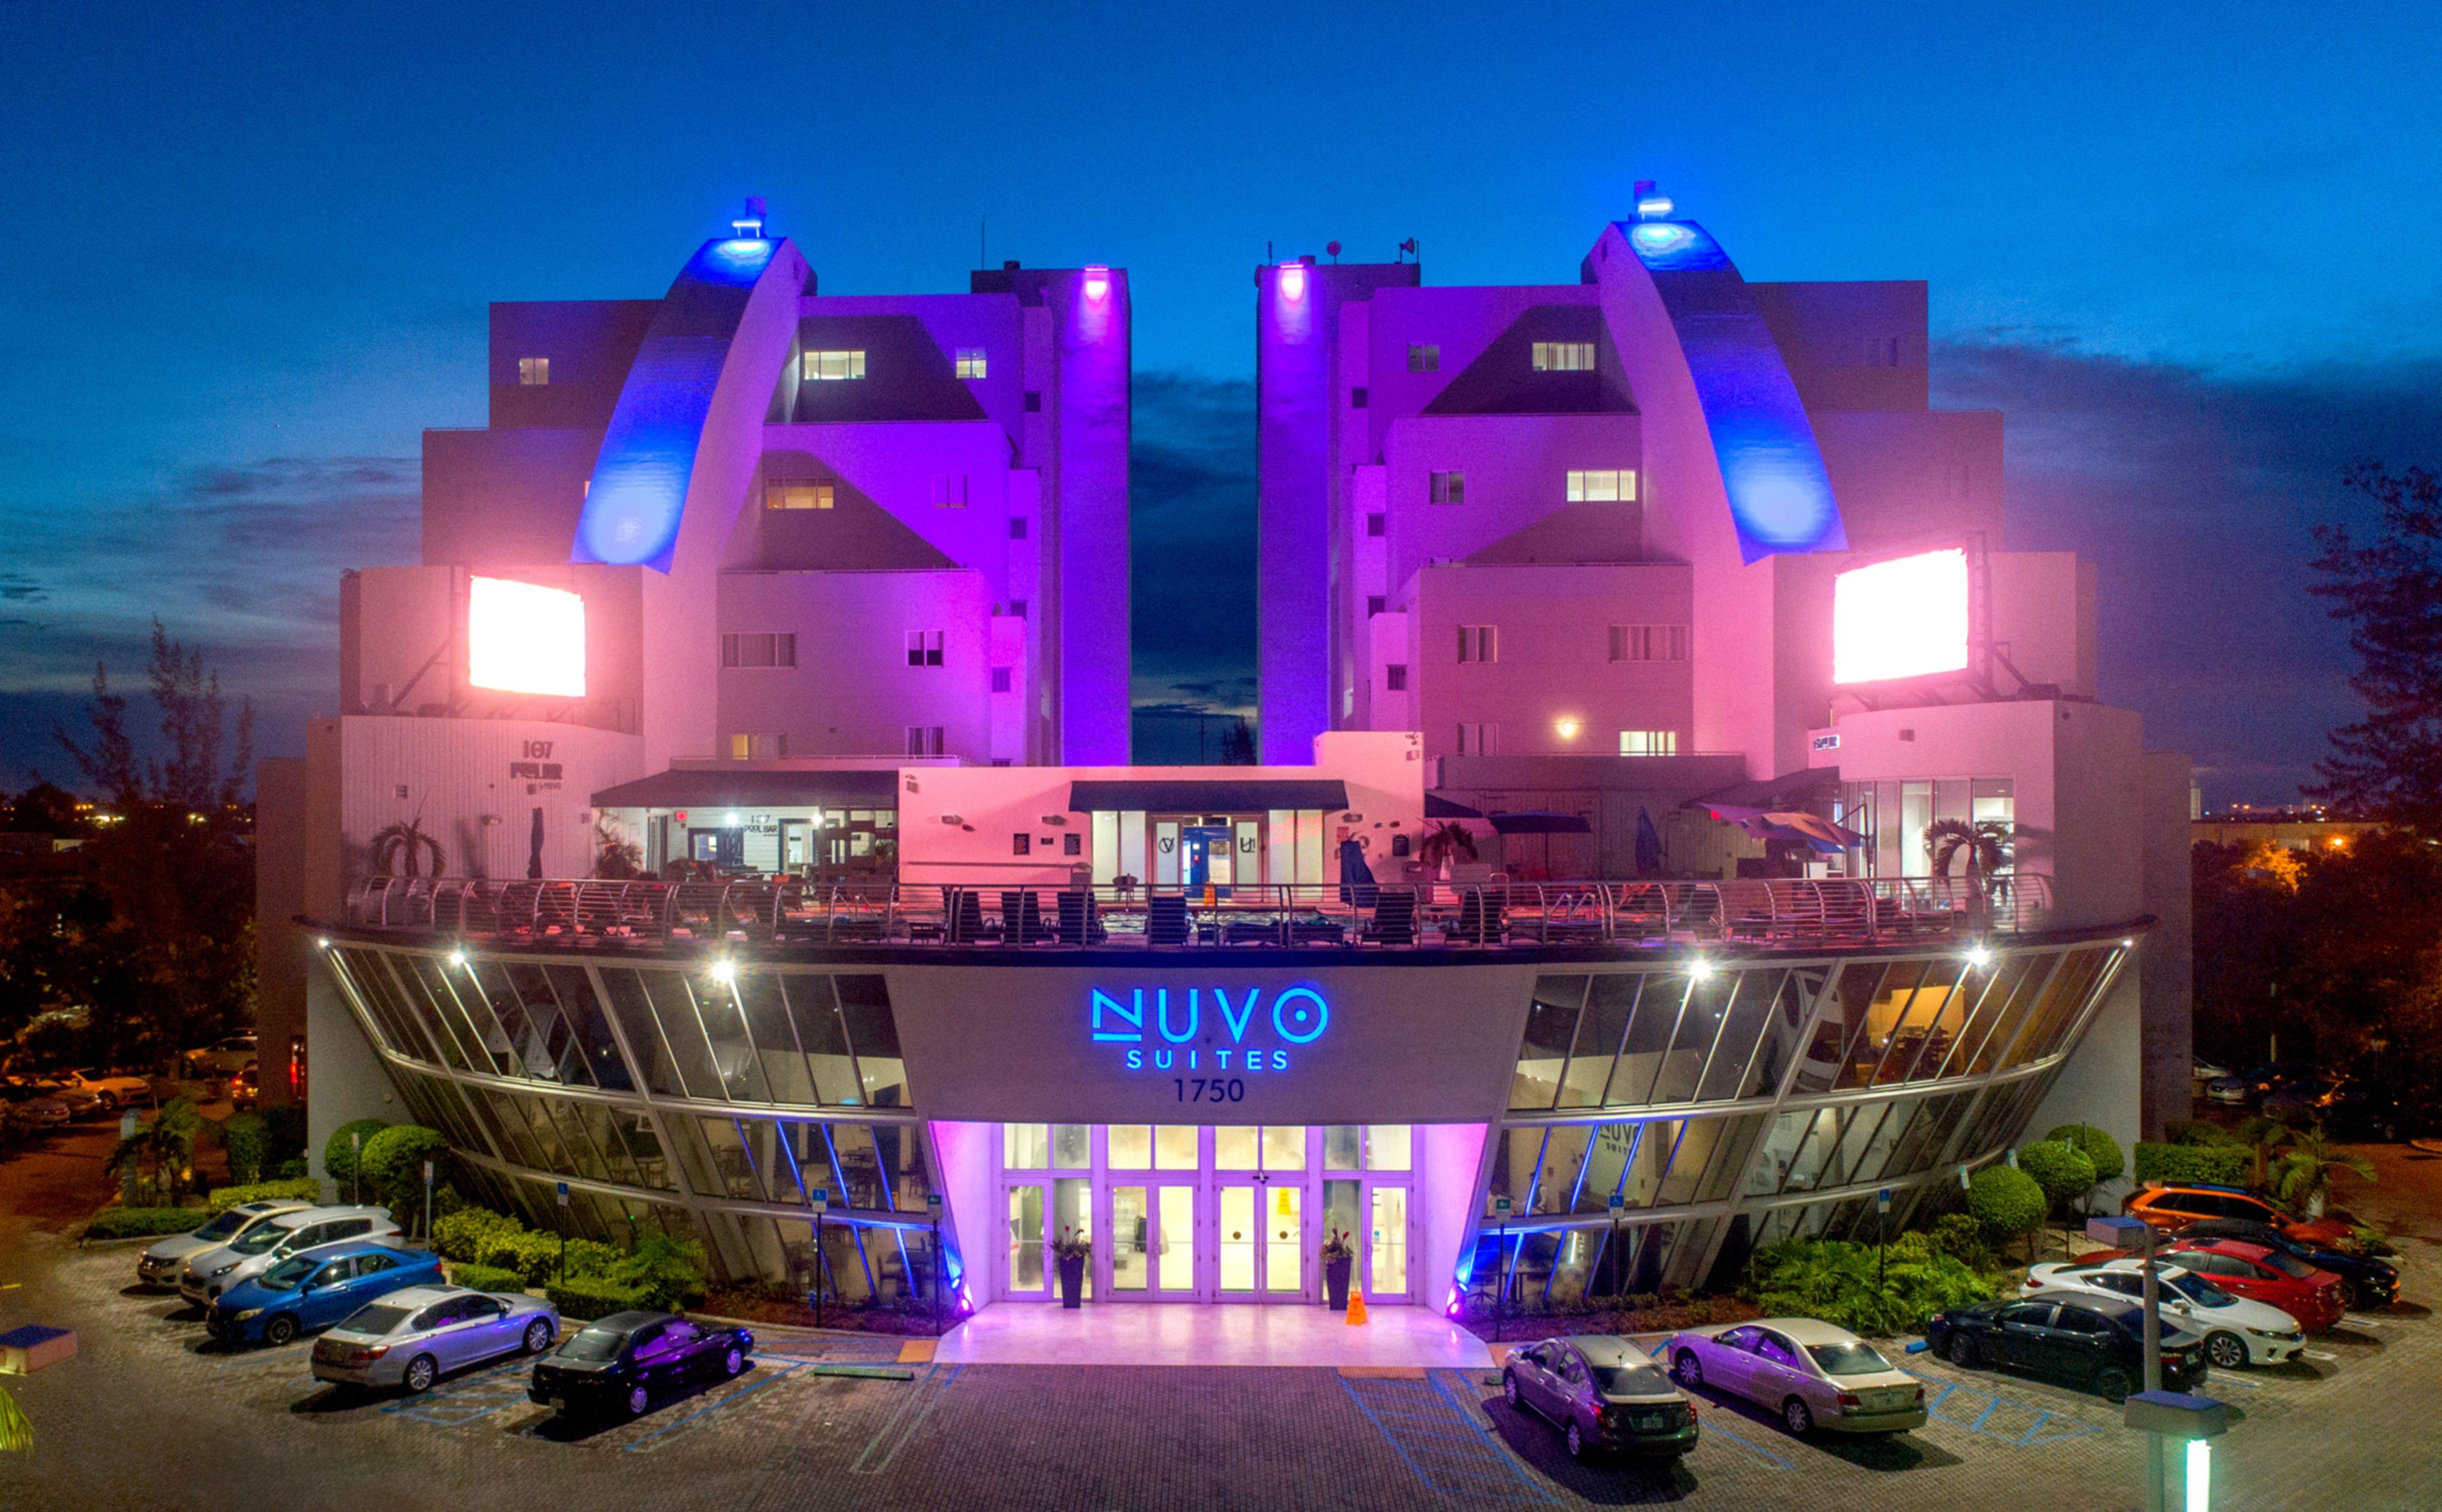 Nuvo Suites Miami Airport West/doral